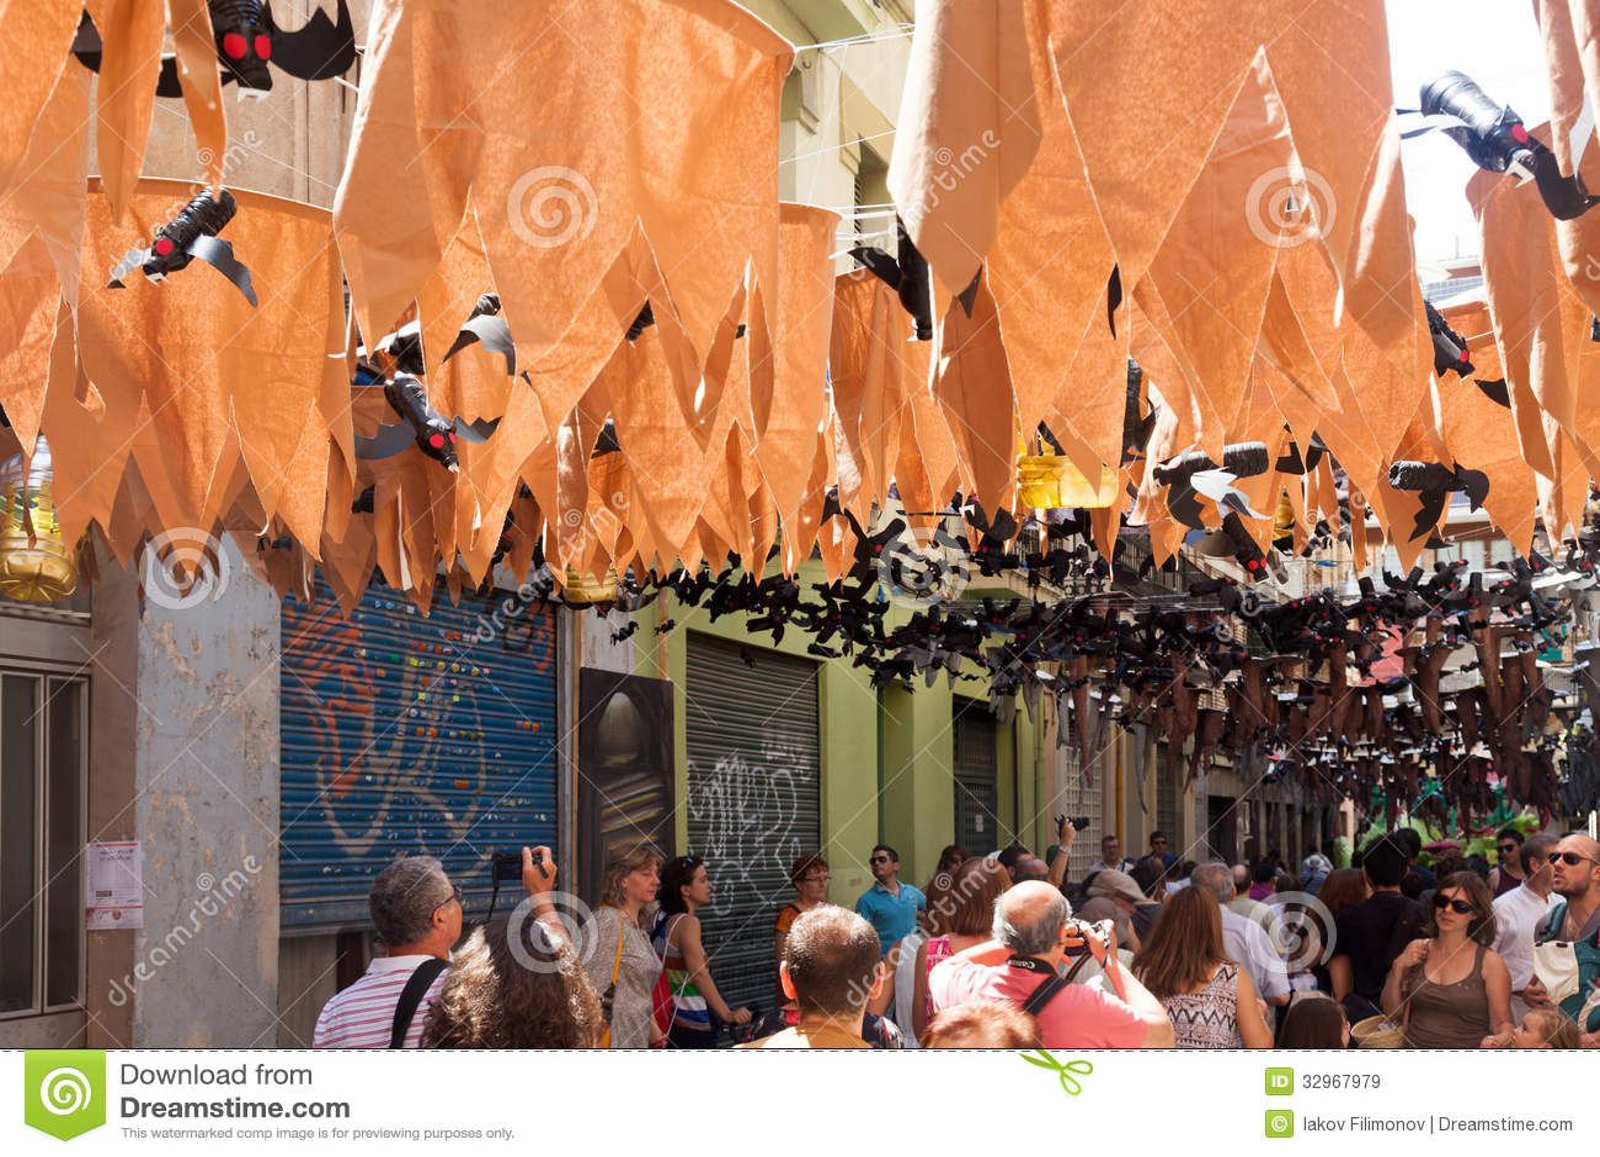 Decorations In Spain Gracia Festival Decorations In Barcelona Spain Editorial